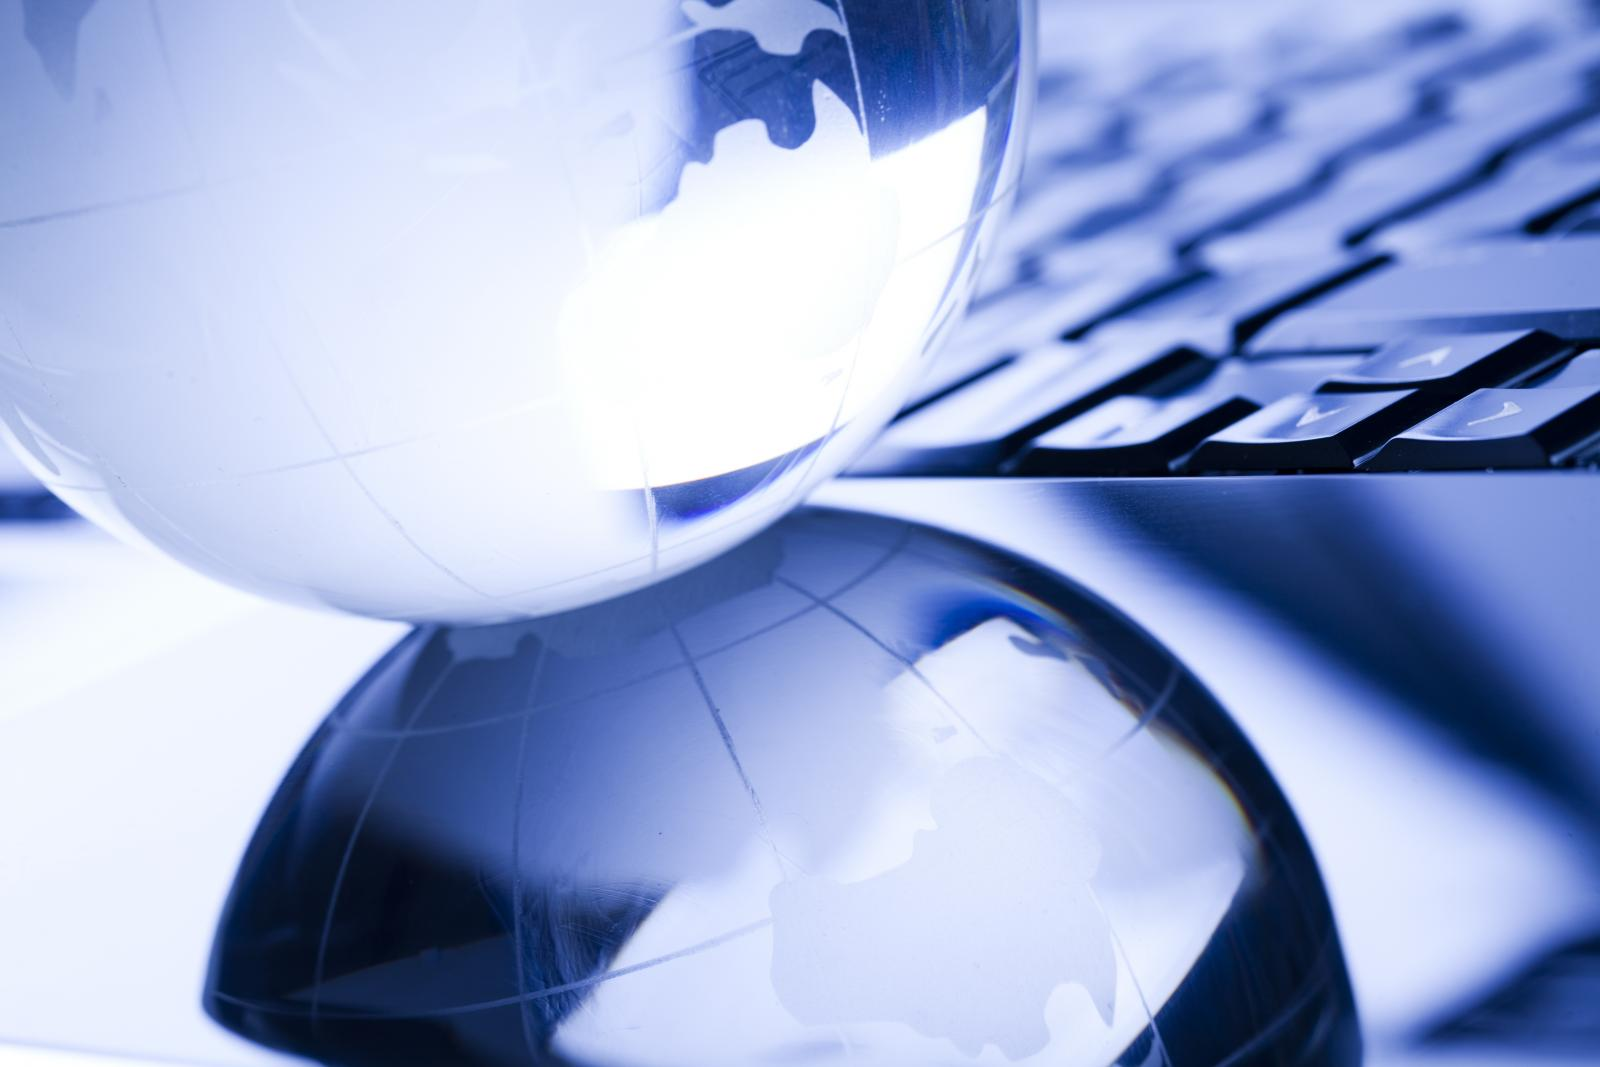 'Digital Transformation' นักสื่อสาร – นักการตลาด ต้อง Strong แบบมีสติ !